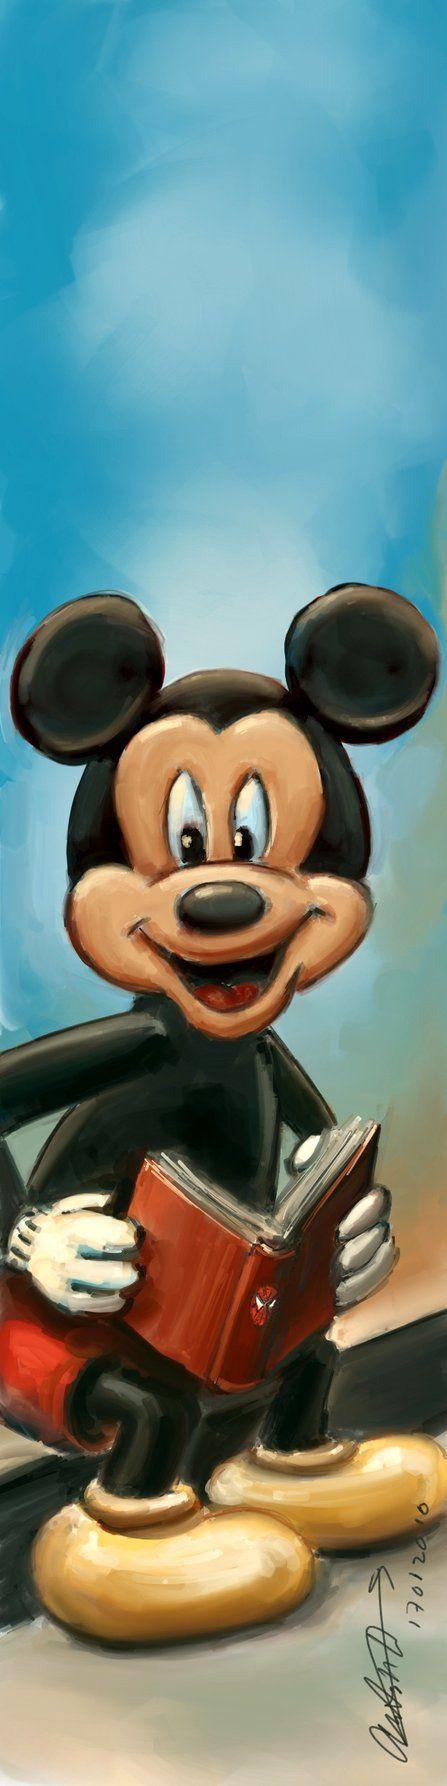 Mickey Mouse Bookmark by antonvandort